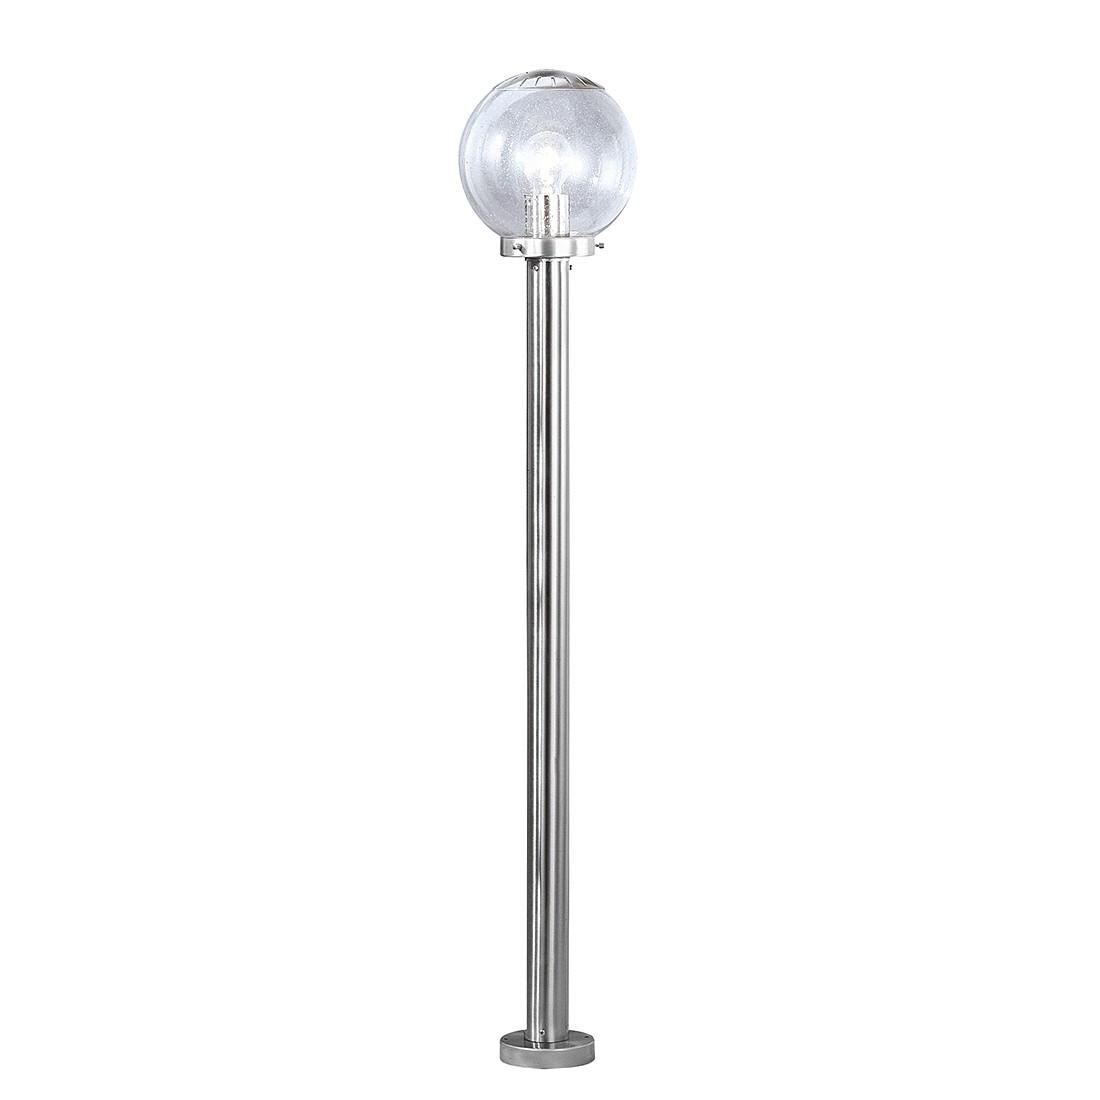 EEK A++, Außenlampe Bowle V - 1-flammig, Lux